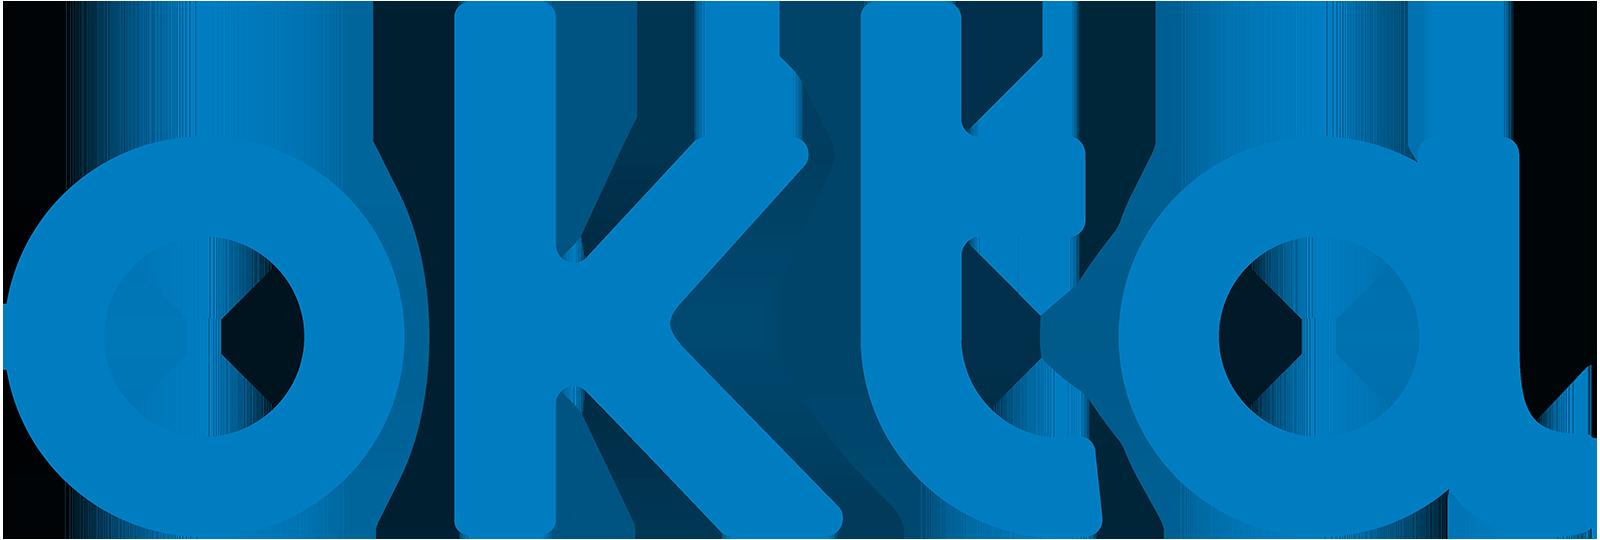 Okta Inc